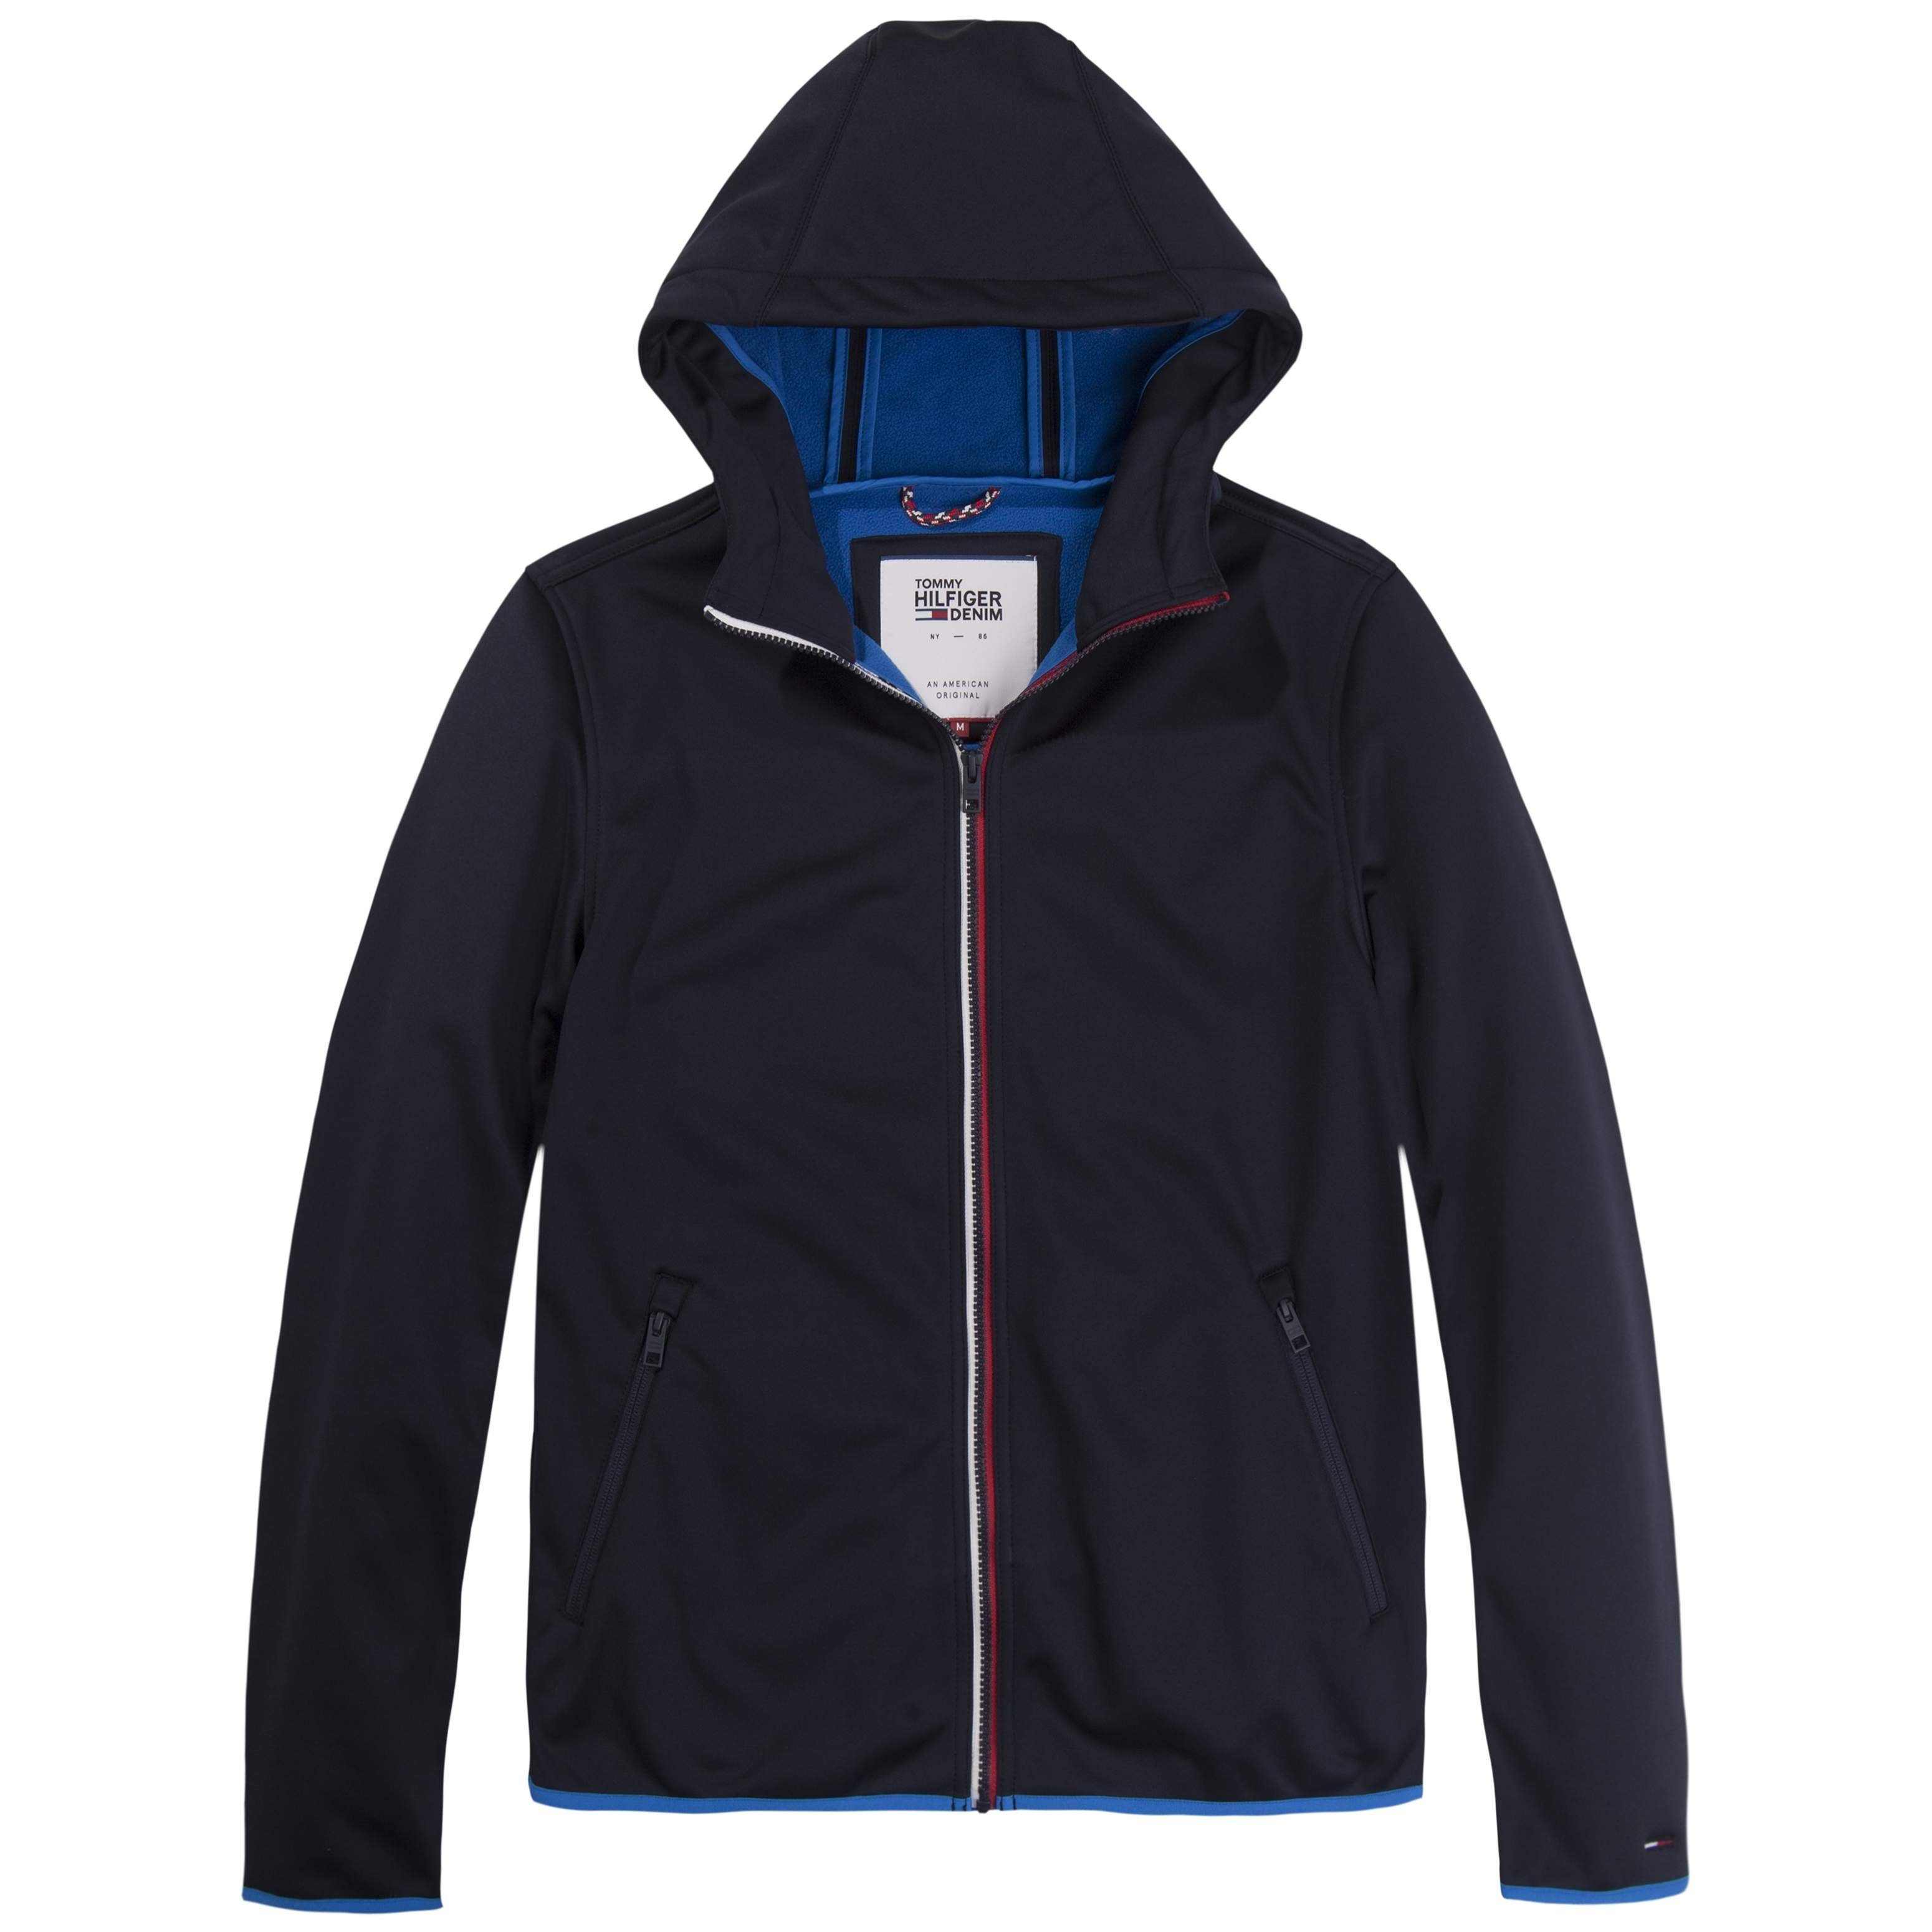 Hilfiger Denim Soft Shell Jacket Jacke 16«Otto »thdm VGqSUpzM